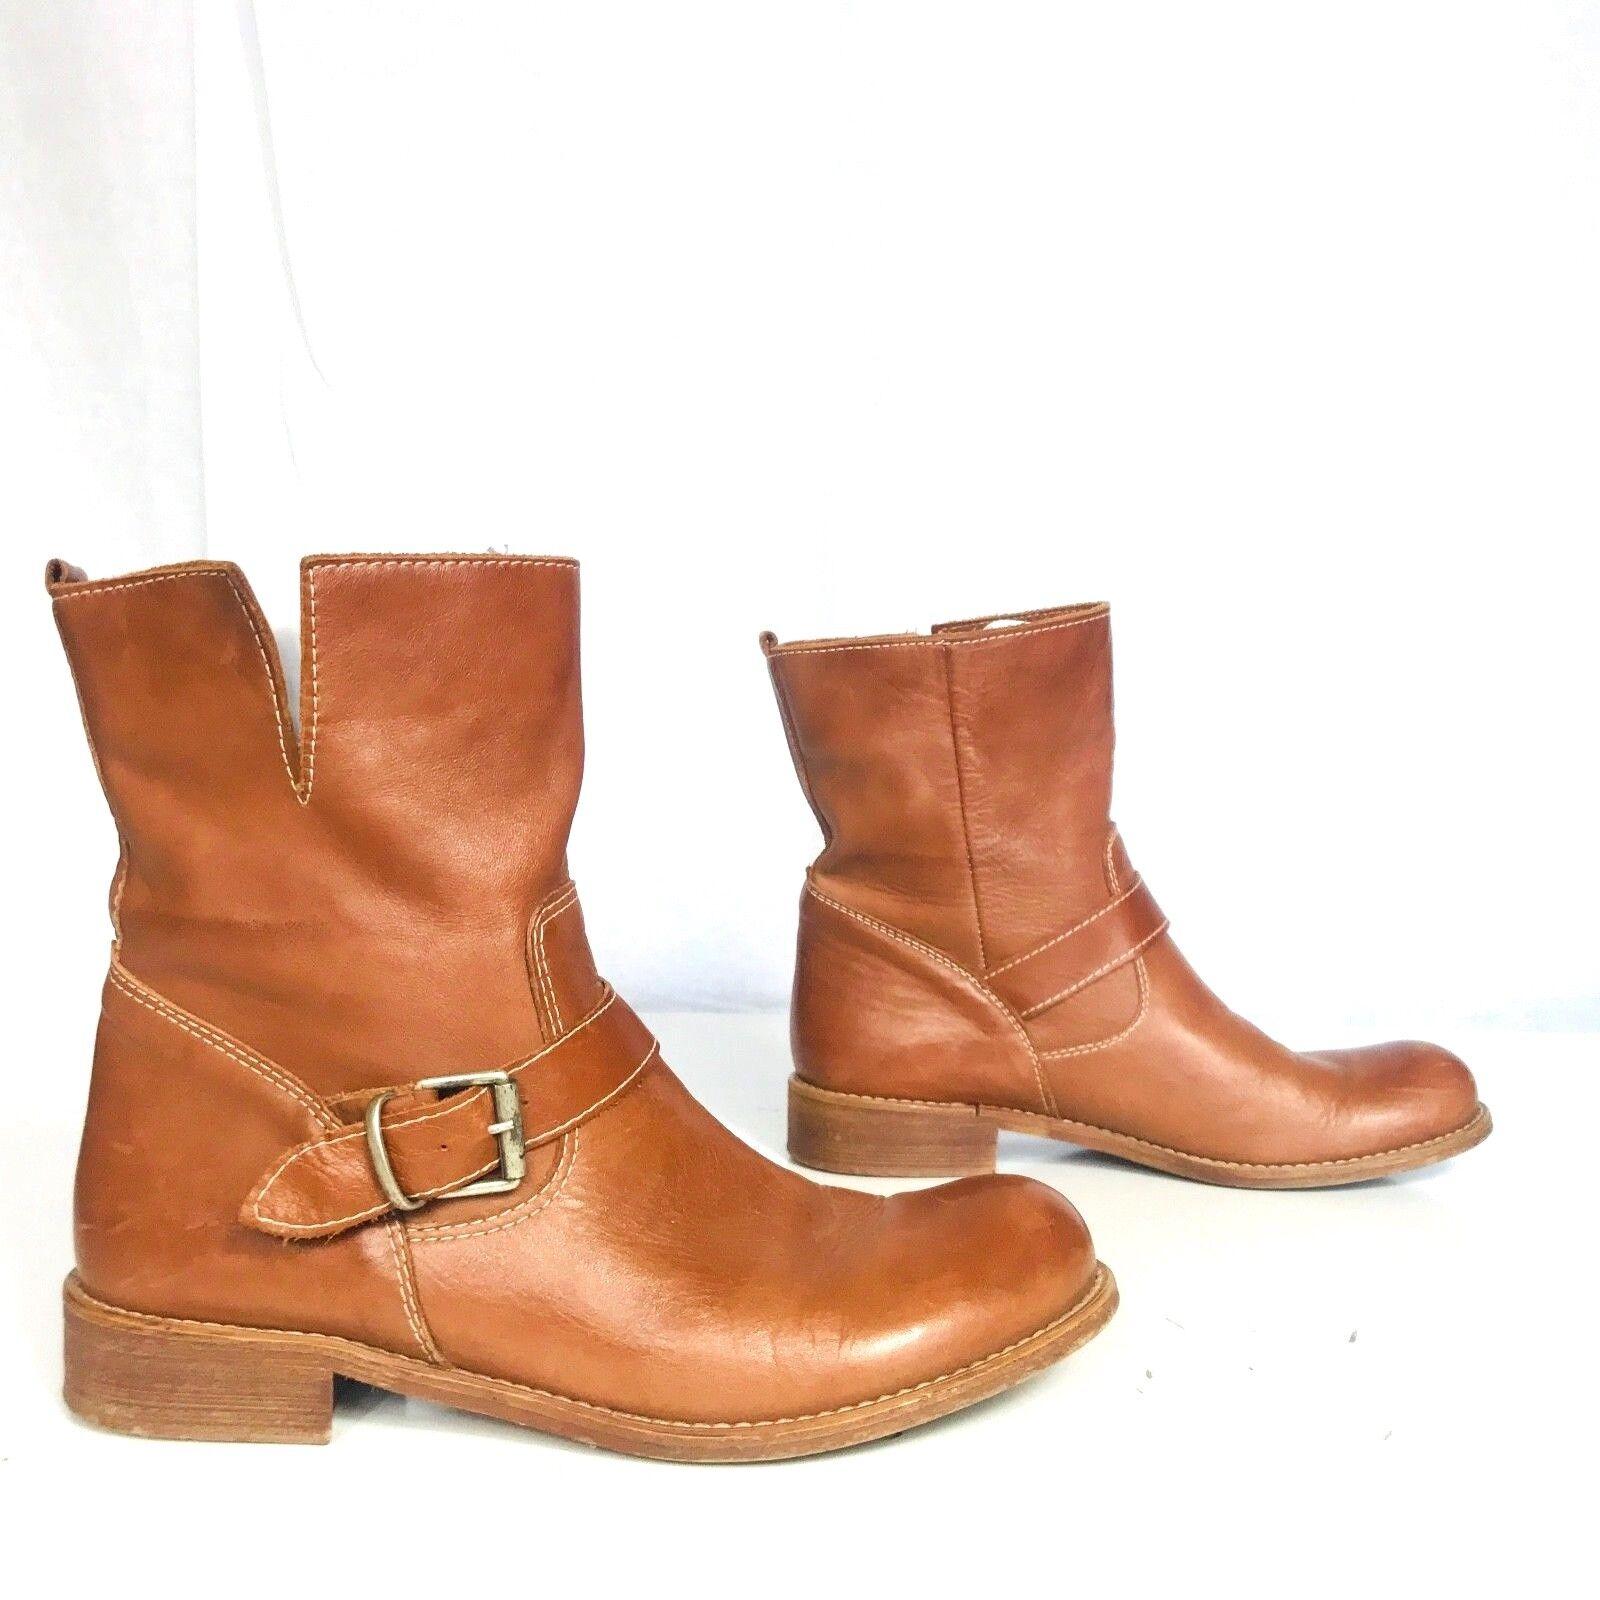 Lavorazione Artigiana  size 41 US 8.5 men Carrter cognac brown riding boots